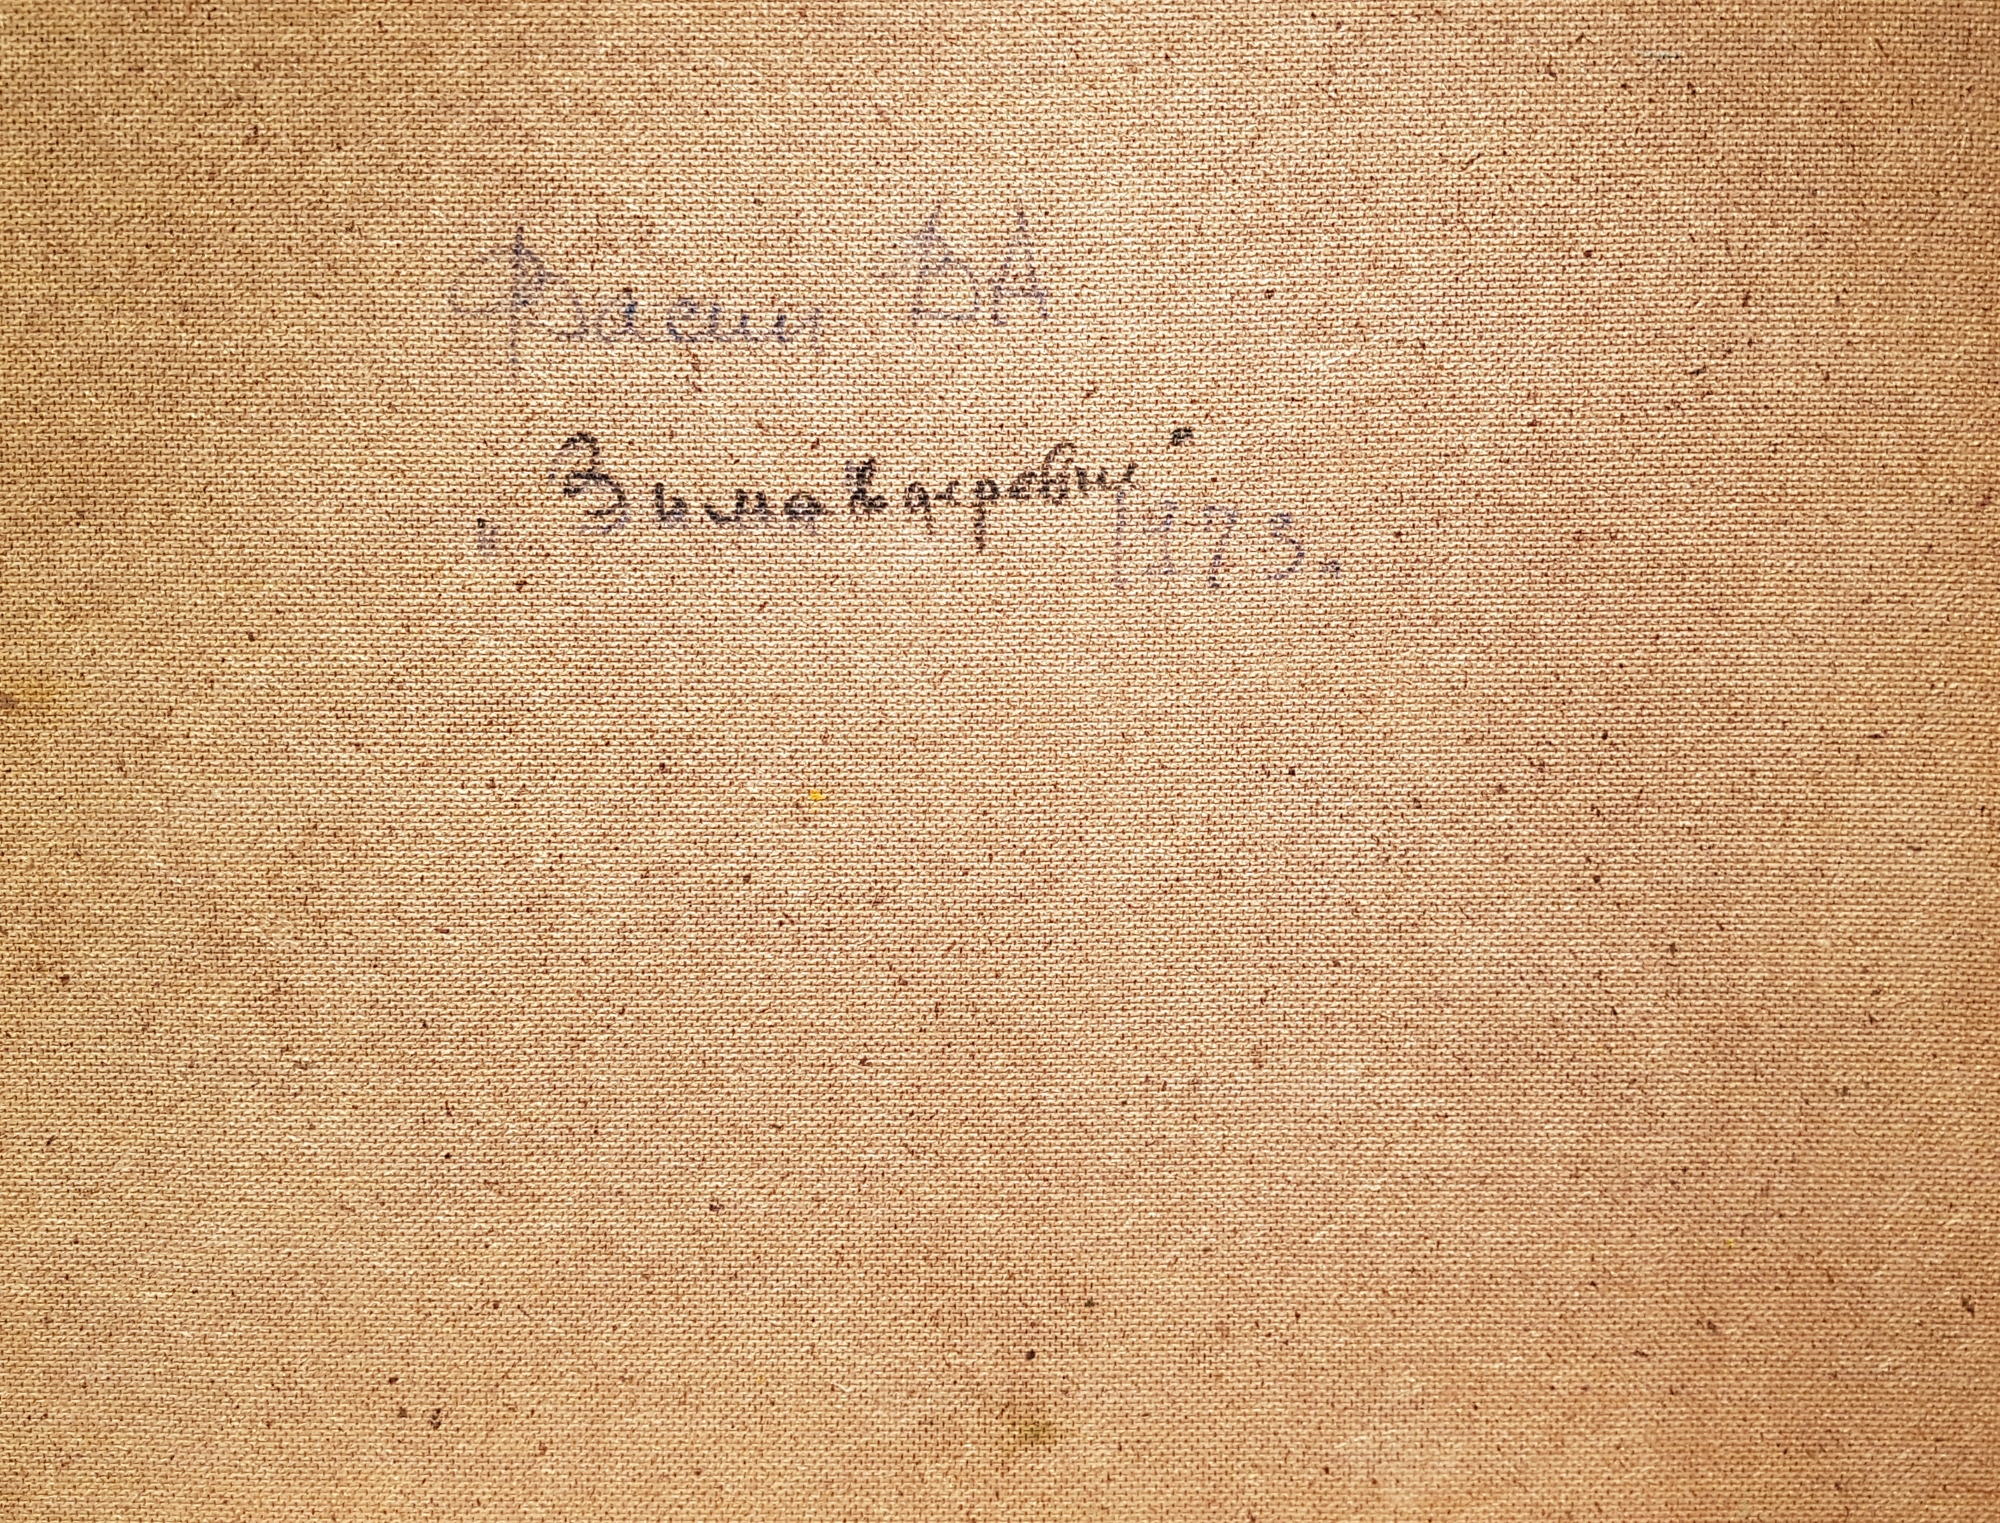 Оборот. Васин Владимир Алексеевич. Зима в деревне